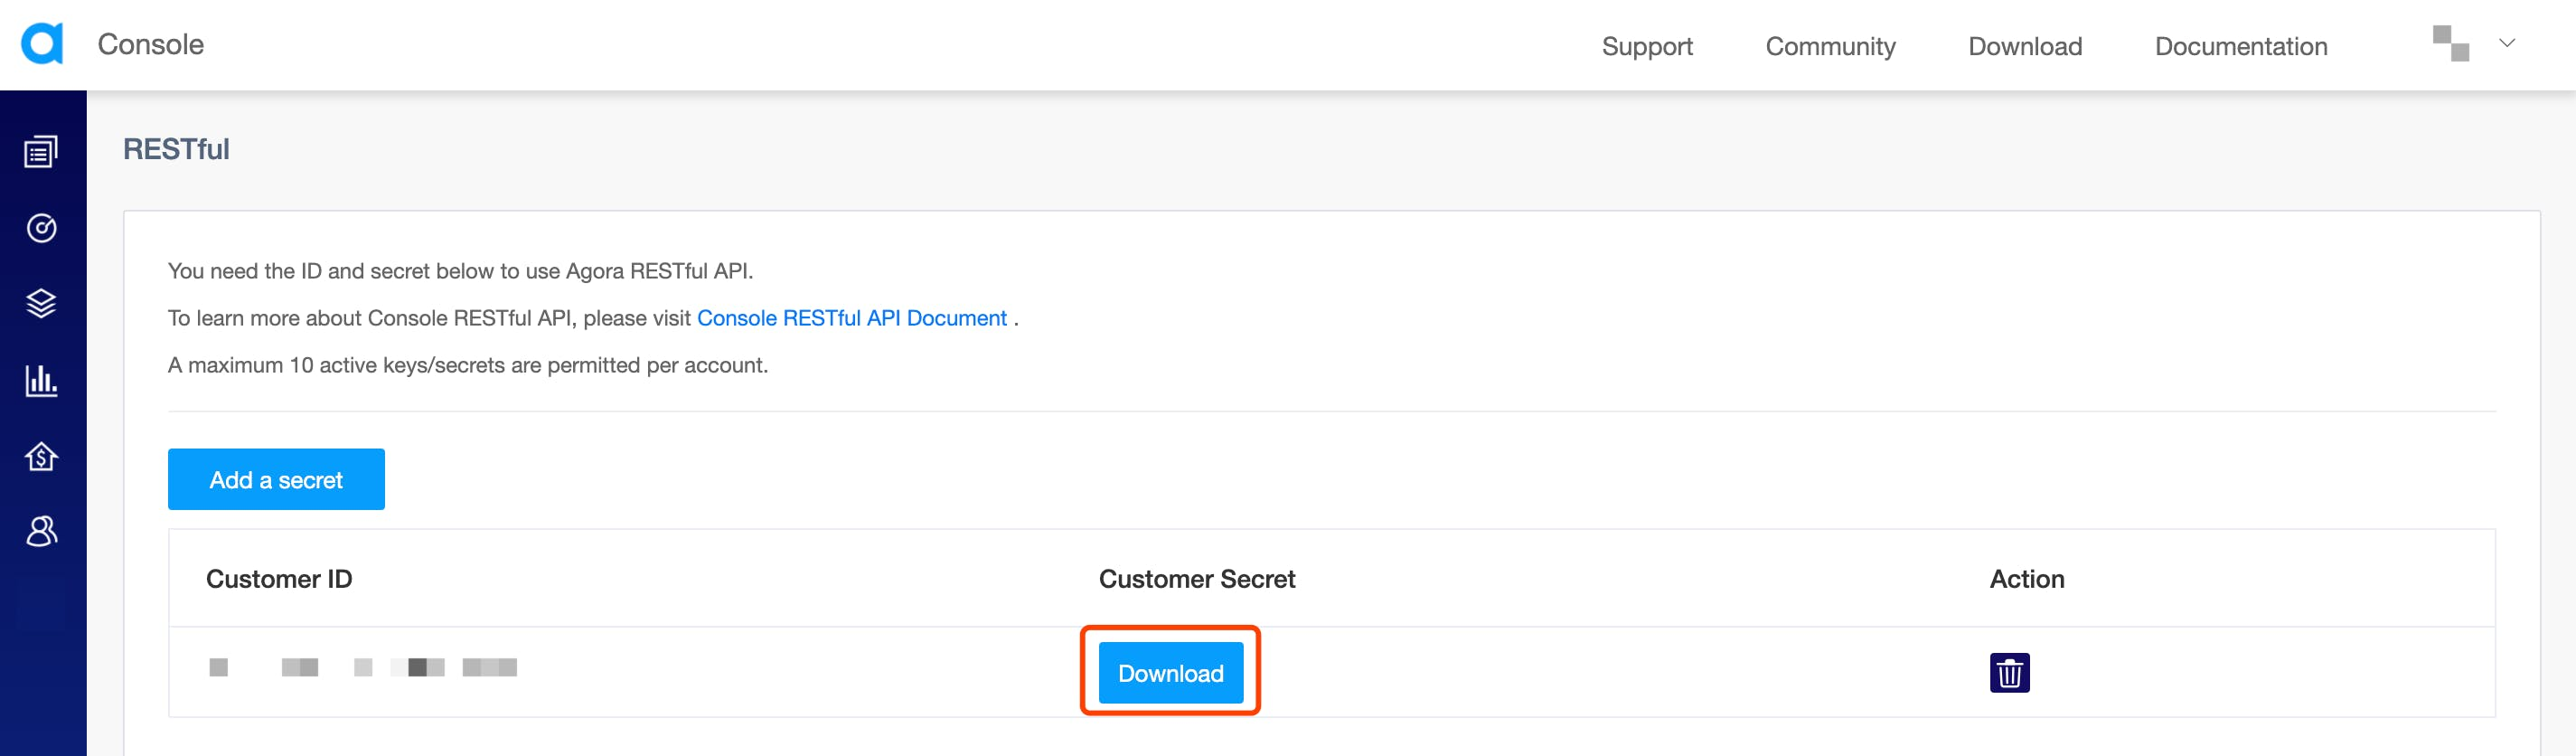 customer_secret.png